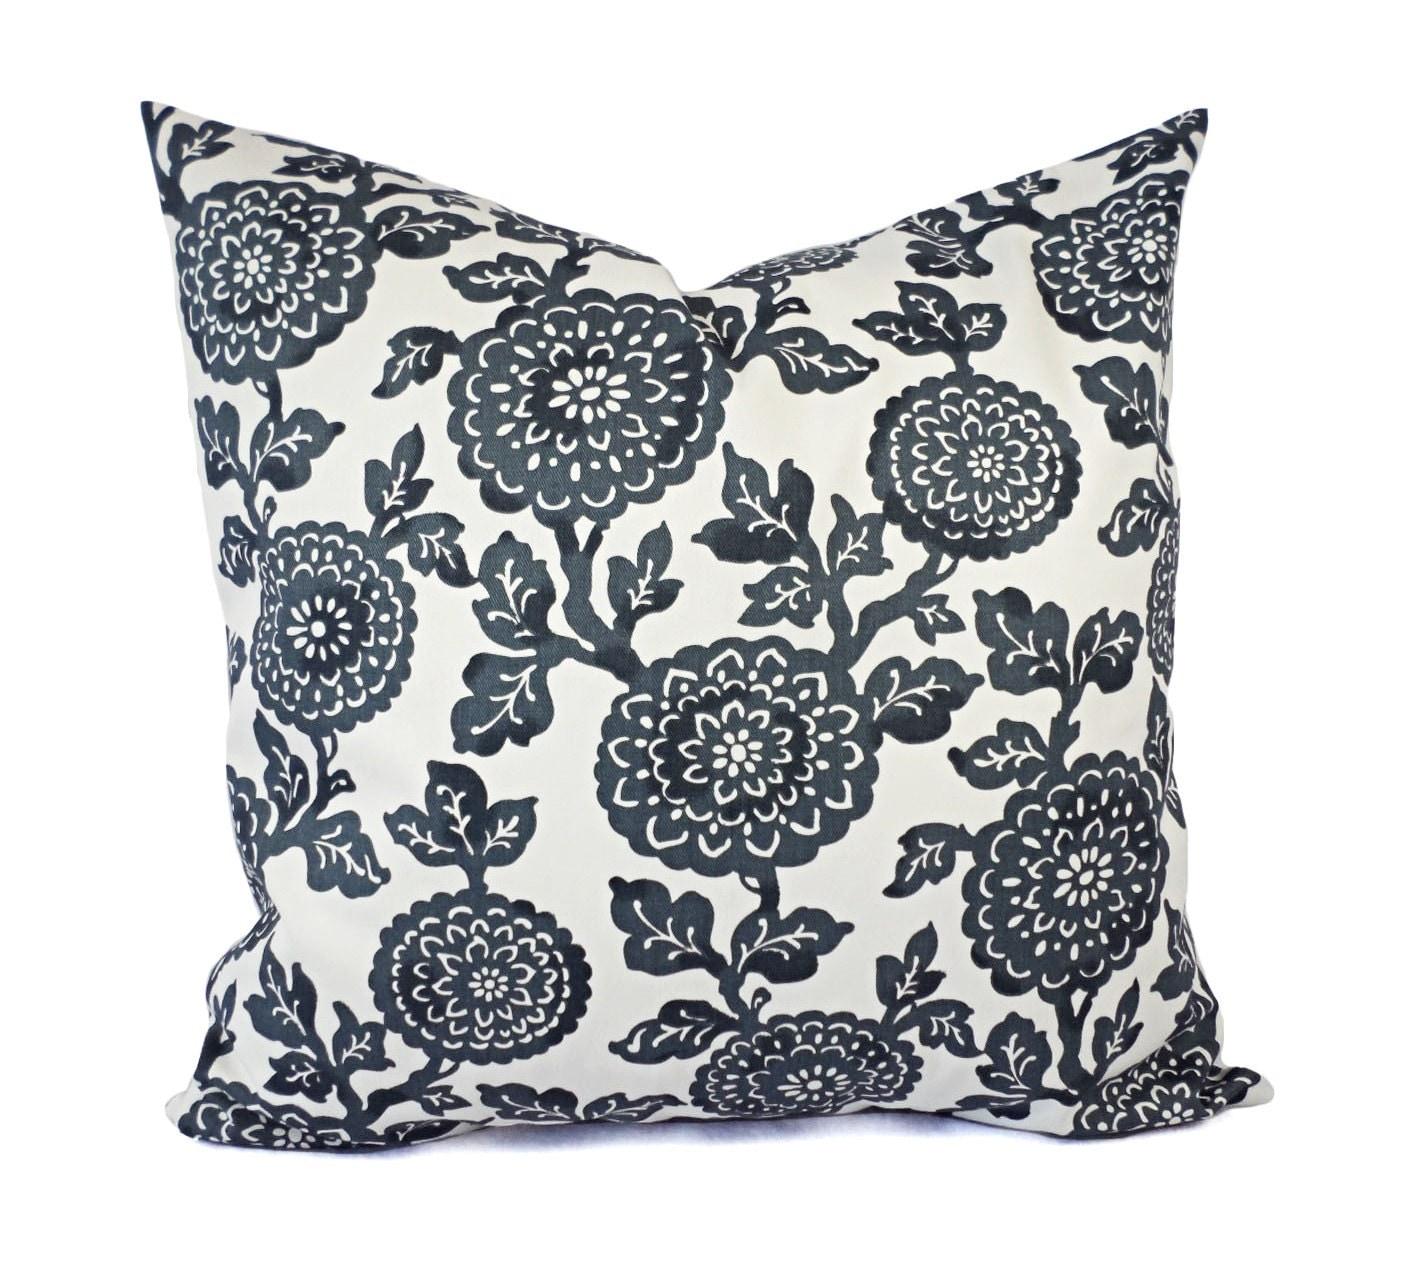 Dark Gray Decorative Pillow : Two Dark Grey Decorative Pillows Grey Throw Pillow Covers